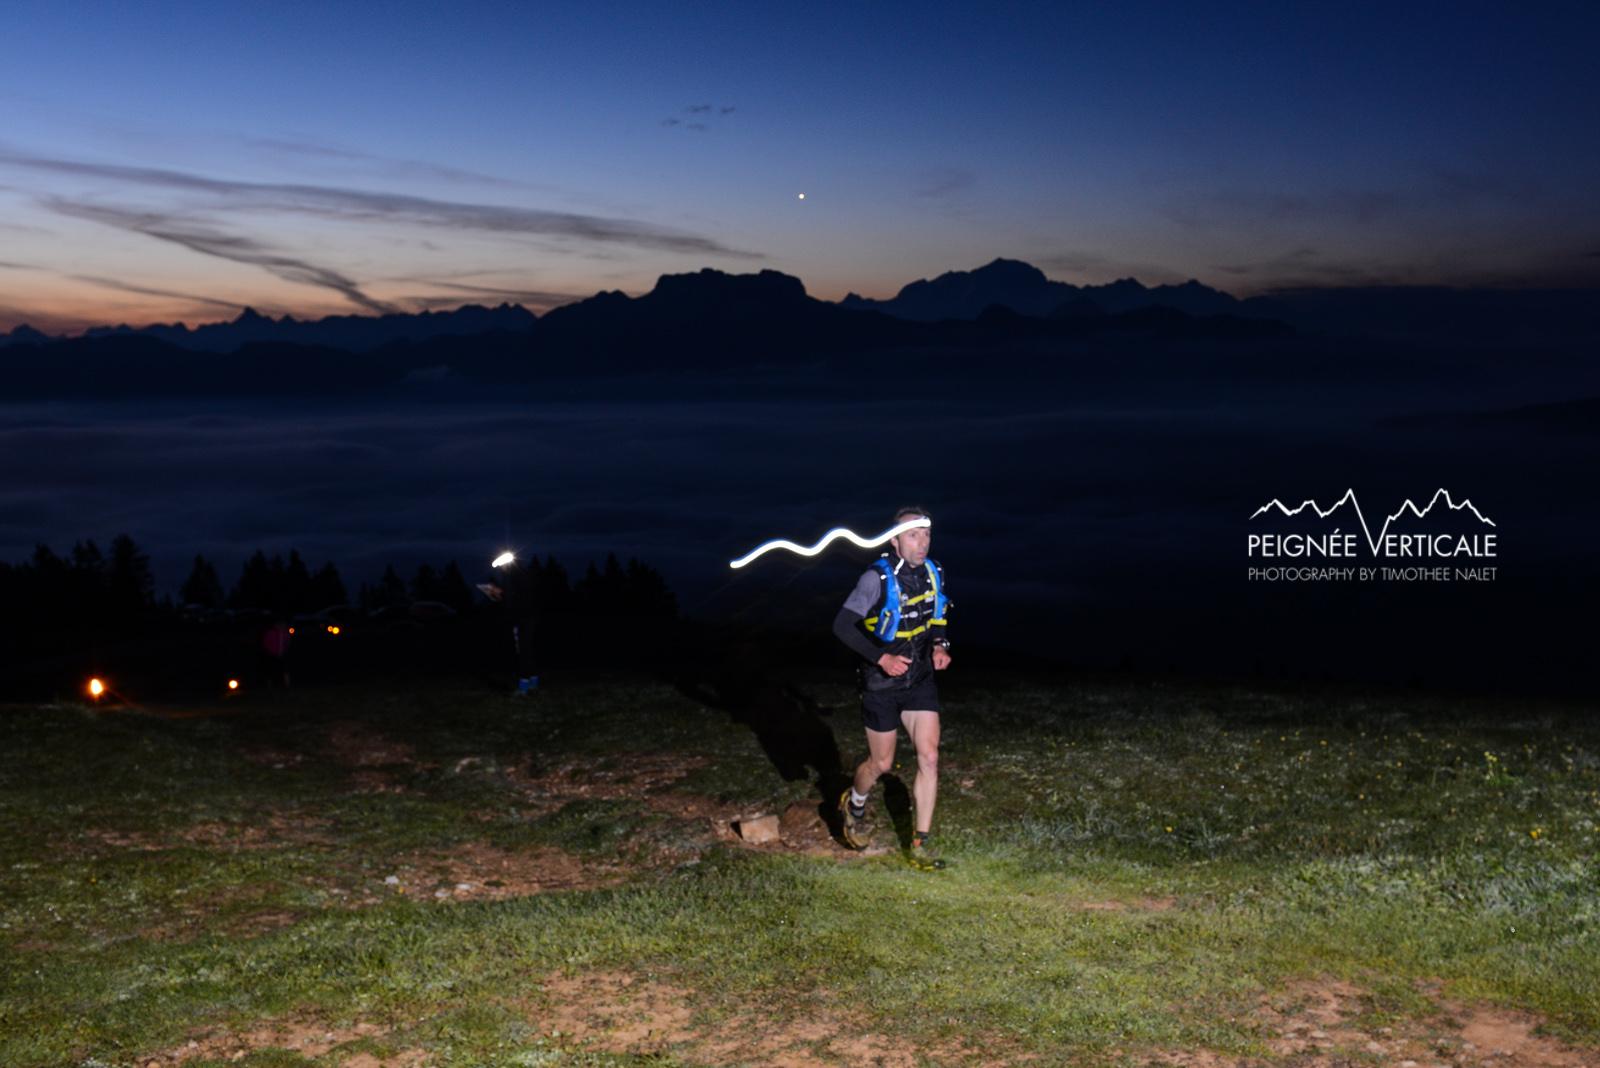 MaxiRace-Annecy-2014-Team-Hoka-Timothee-Nalet-0677.jpg